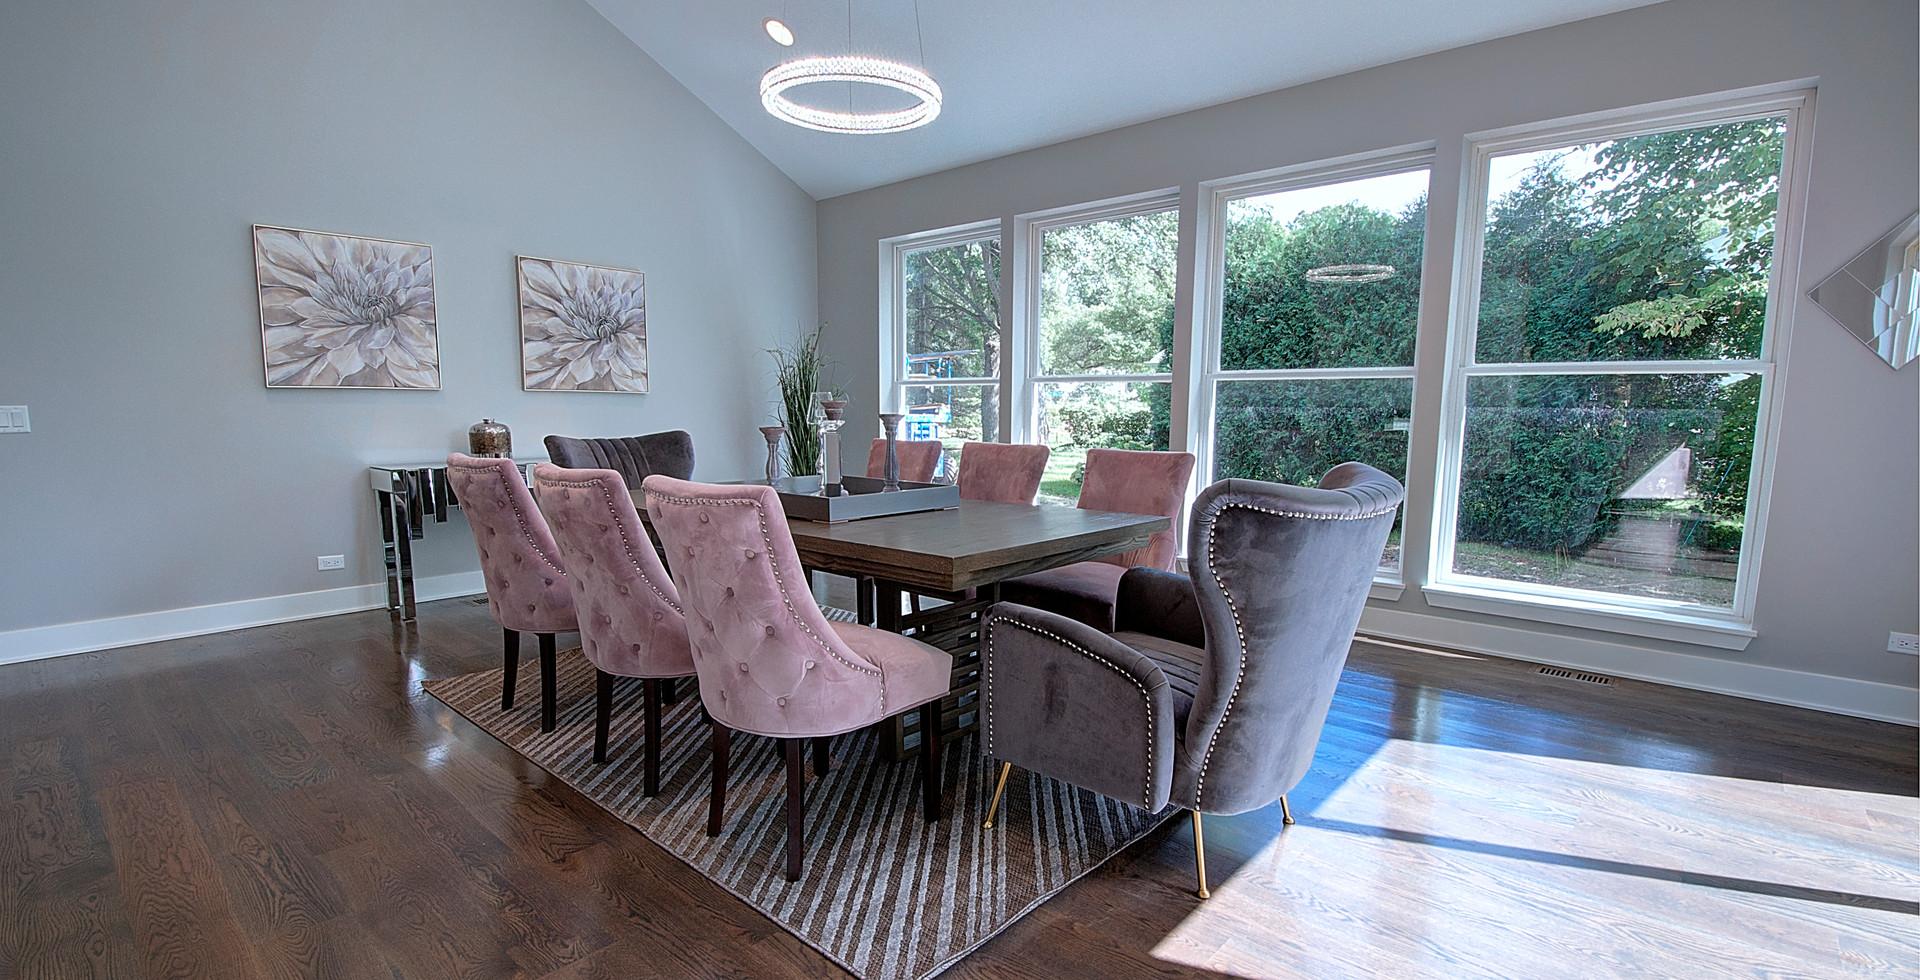 Dining Room in Glenview designed by MRM Home Design.jpg